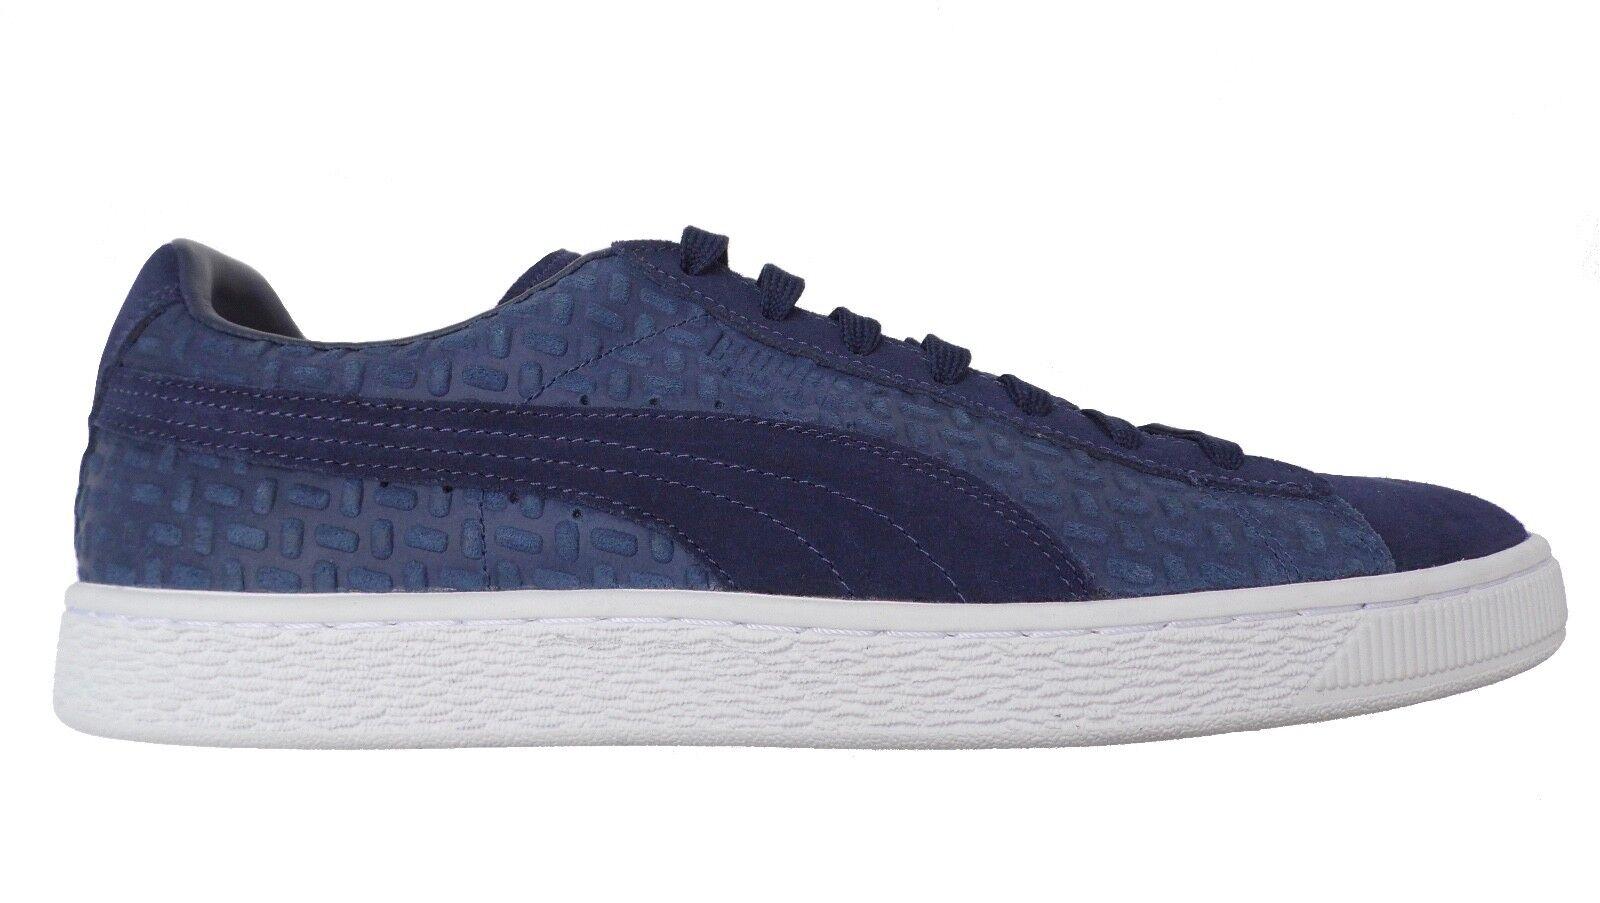 PUMA  Suede Classic Emboss V2 Herren Sneaker Schuhe blaues Relief-Leder  45  Neu